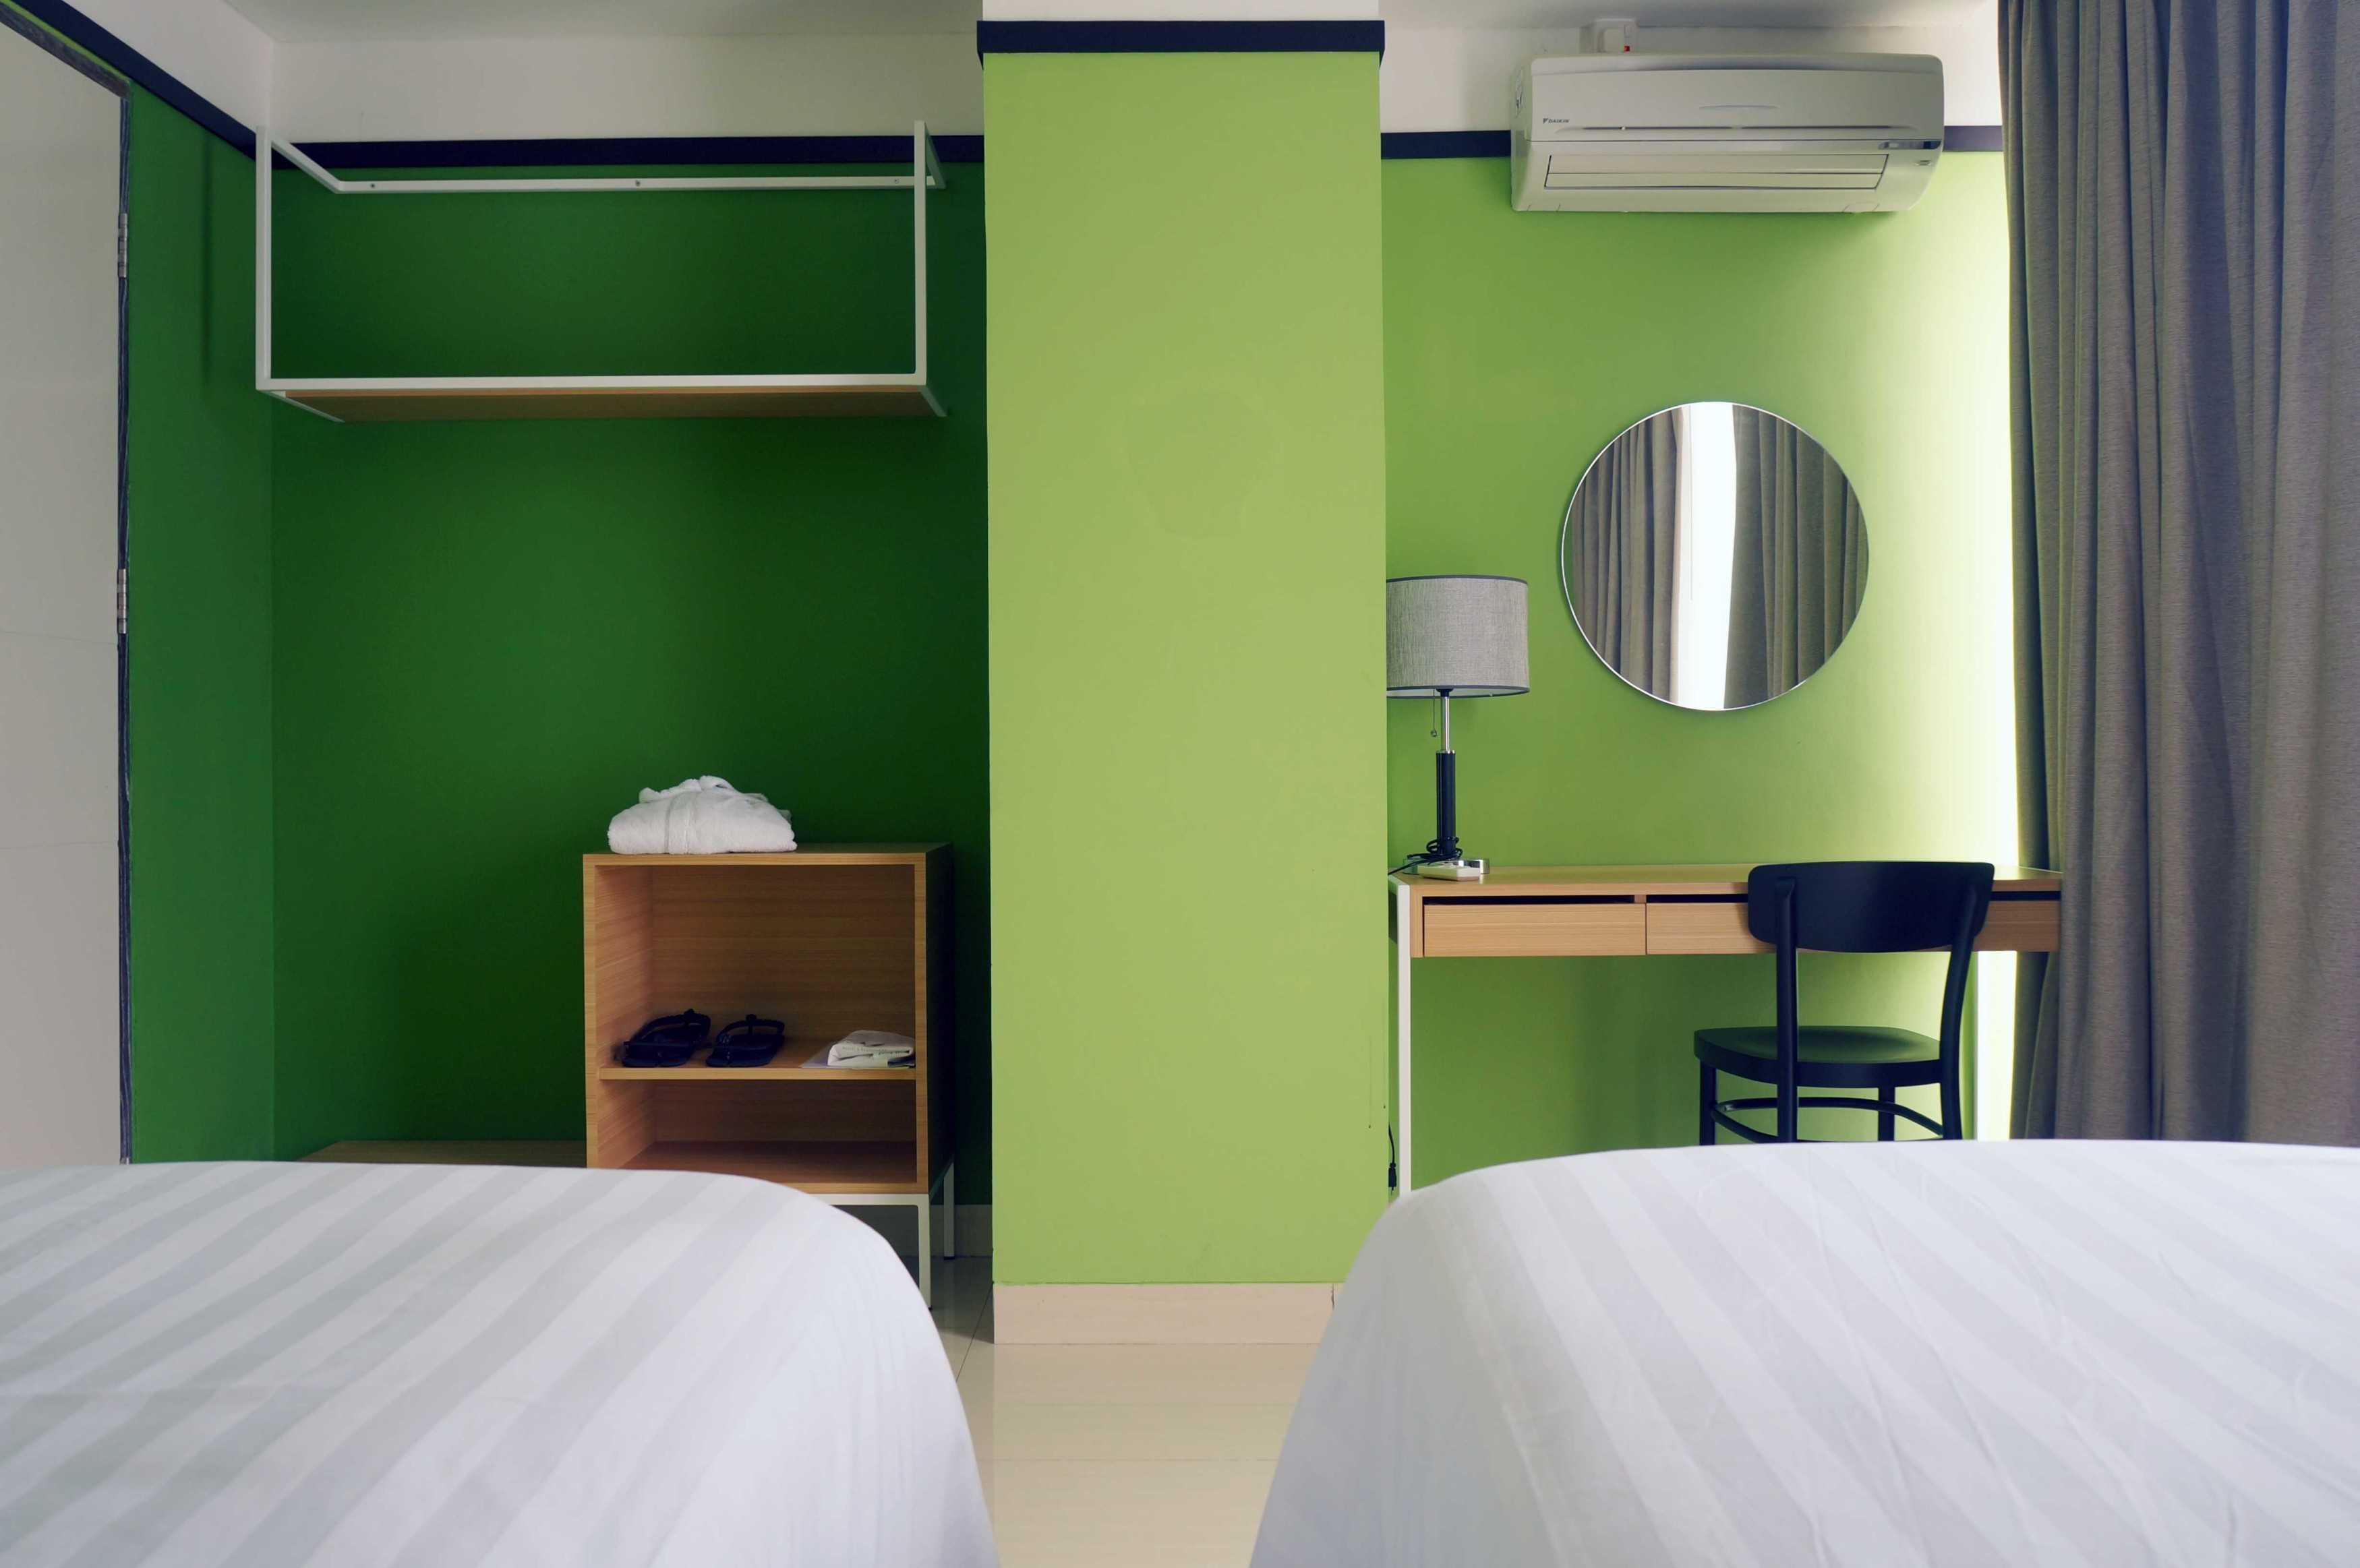 Arkitekt.id Executive Suite No 3 Clove Garden Hotel, Bandung Clove Garden Hotel, Bandung Twin Bedroom Minimalis  29464